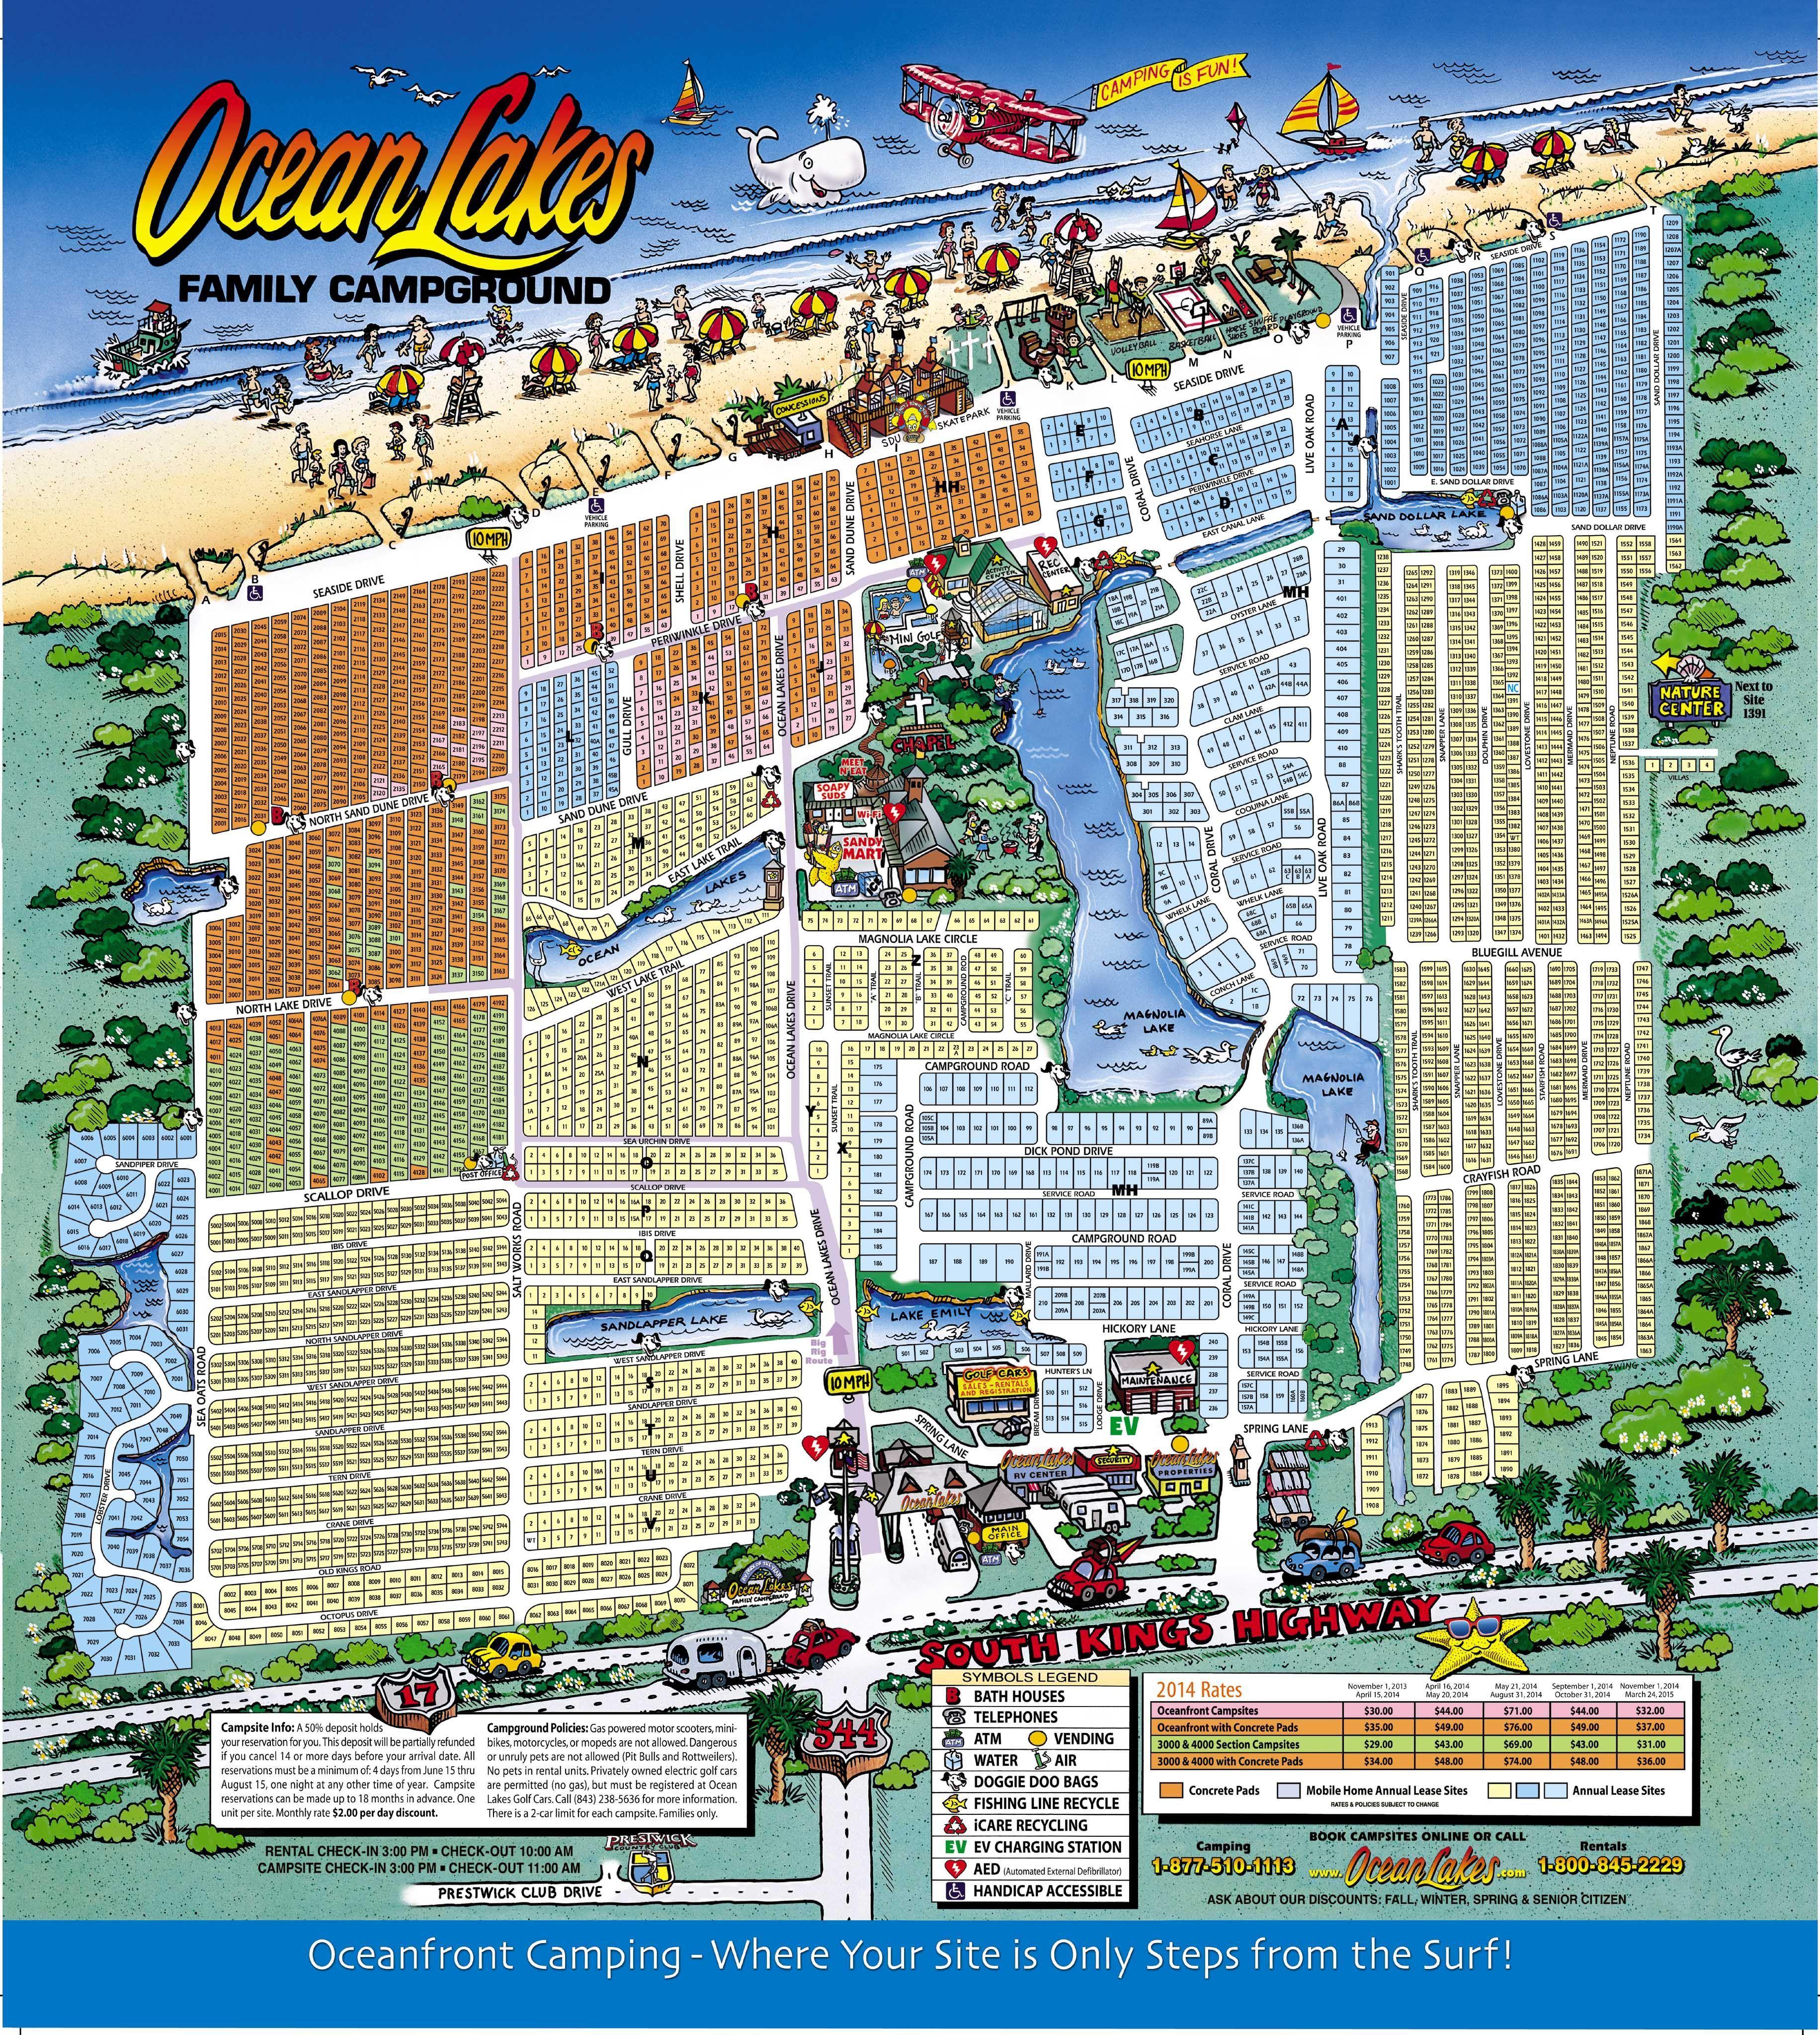 Visit myrtle beach, Camping locations, Myrtle beach